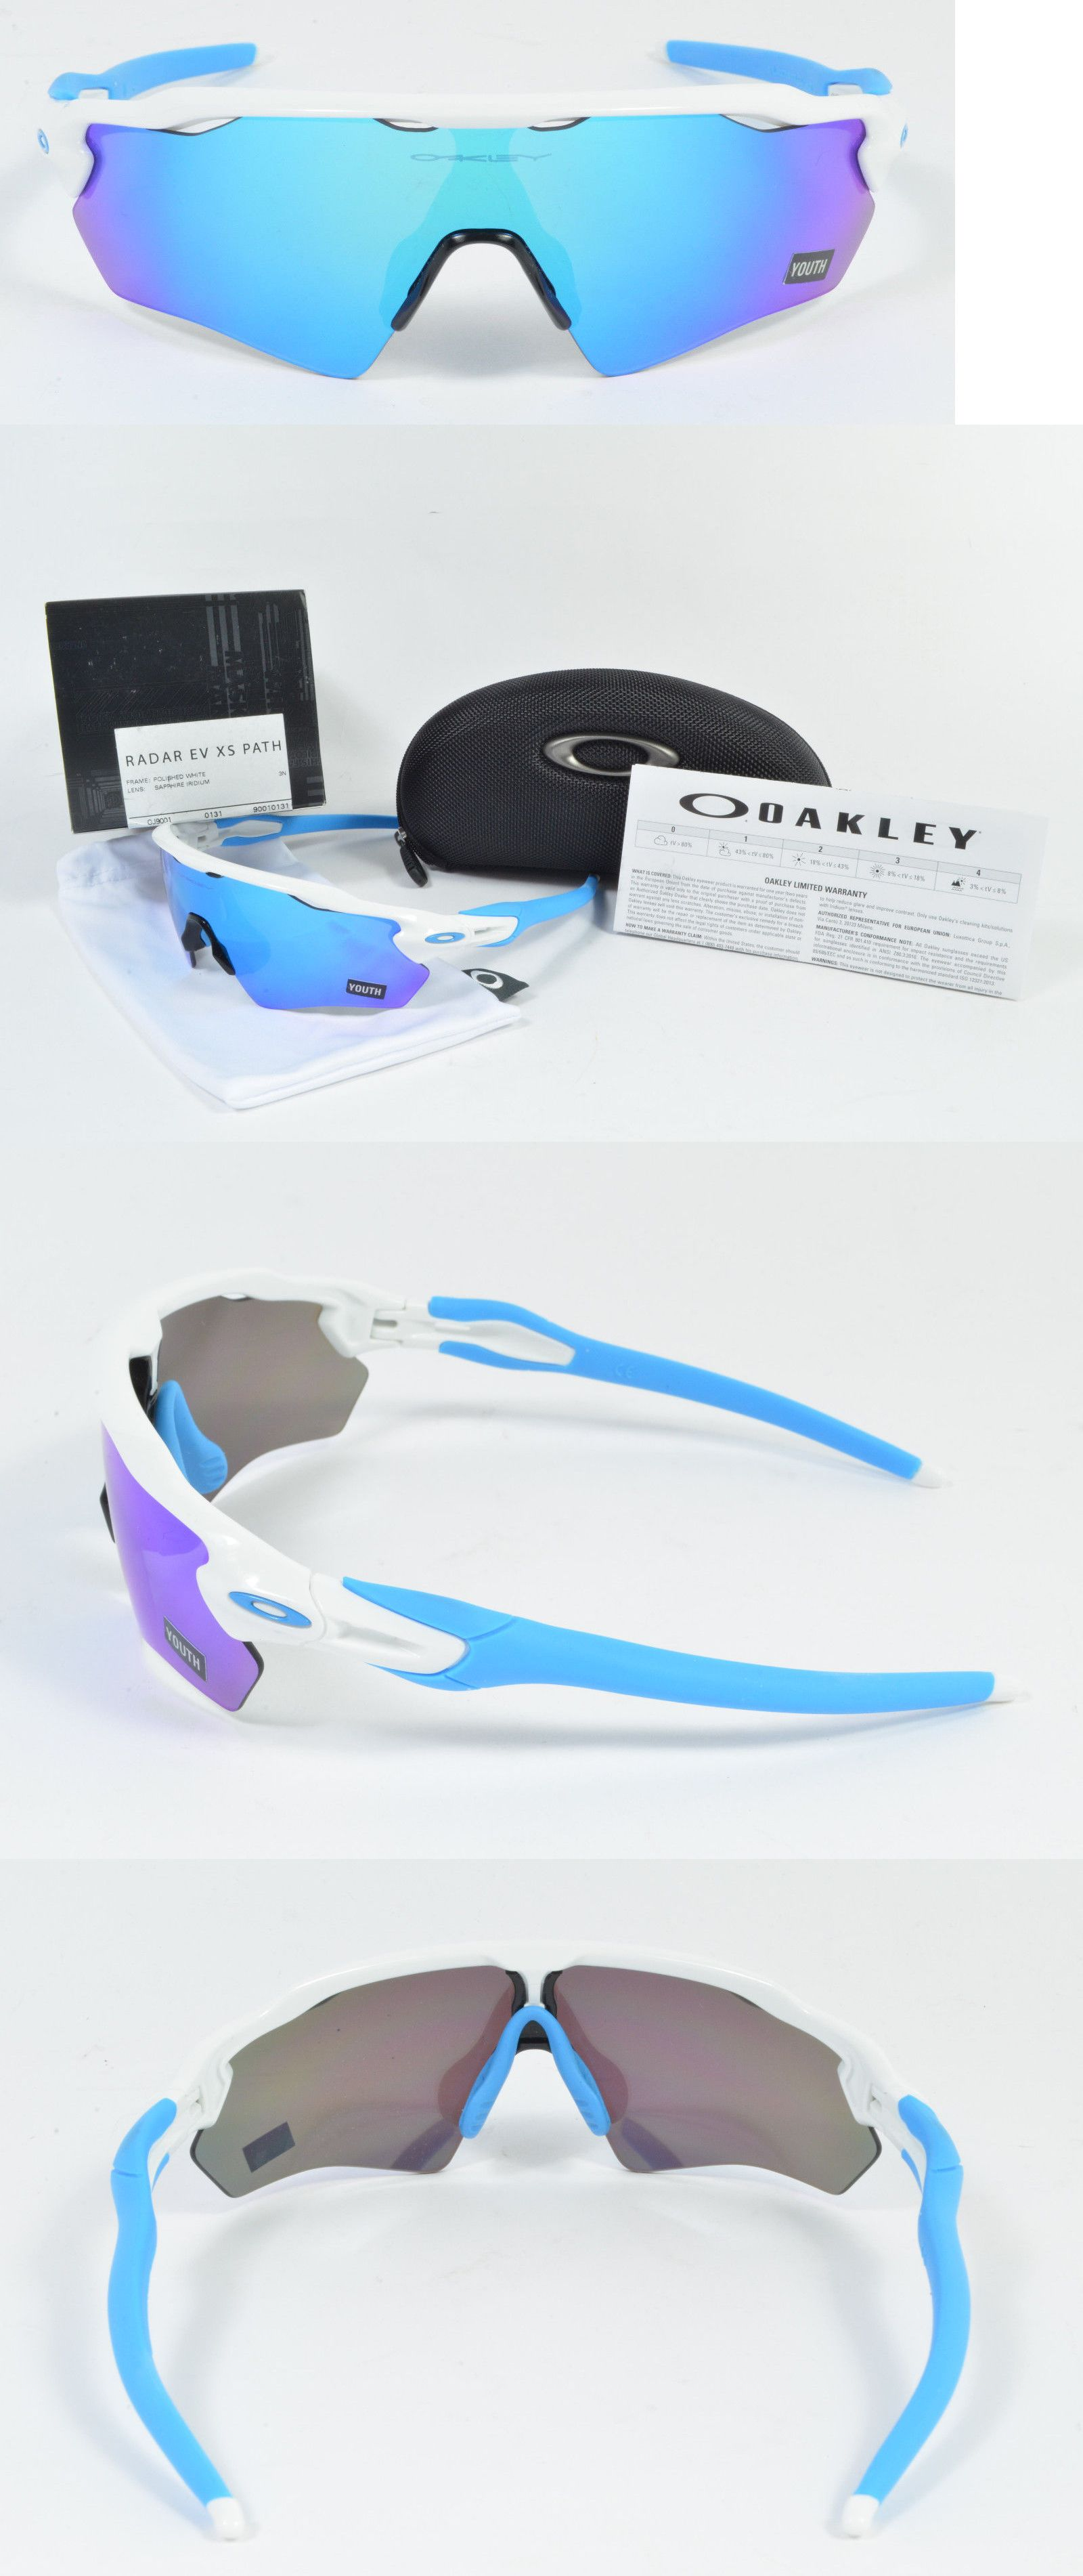 245b7655fc148 Sunglasses 131411  Oakley Radar Ev Xs Path Youth Polished White W Sapphire  Iridium Oj9001-0131 Nib -  BUY IT NOW ONLY   105 on eBay!